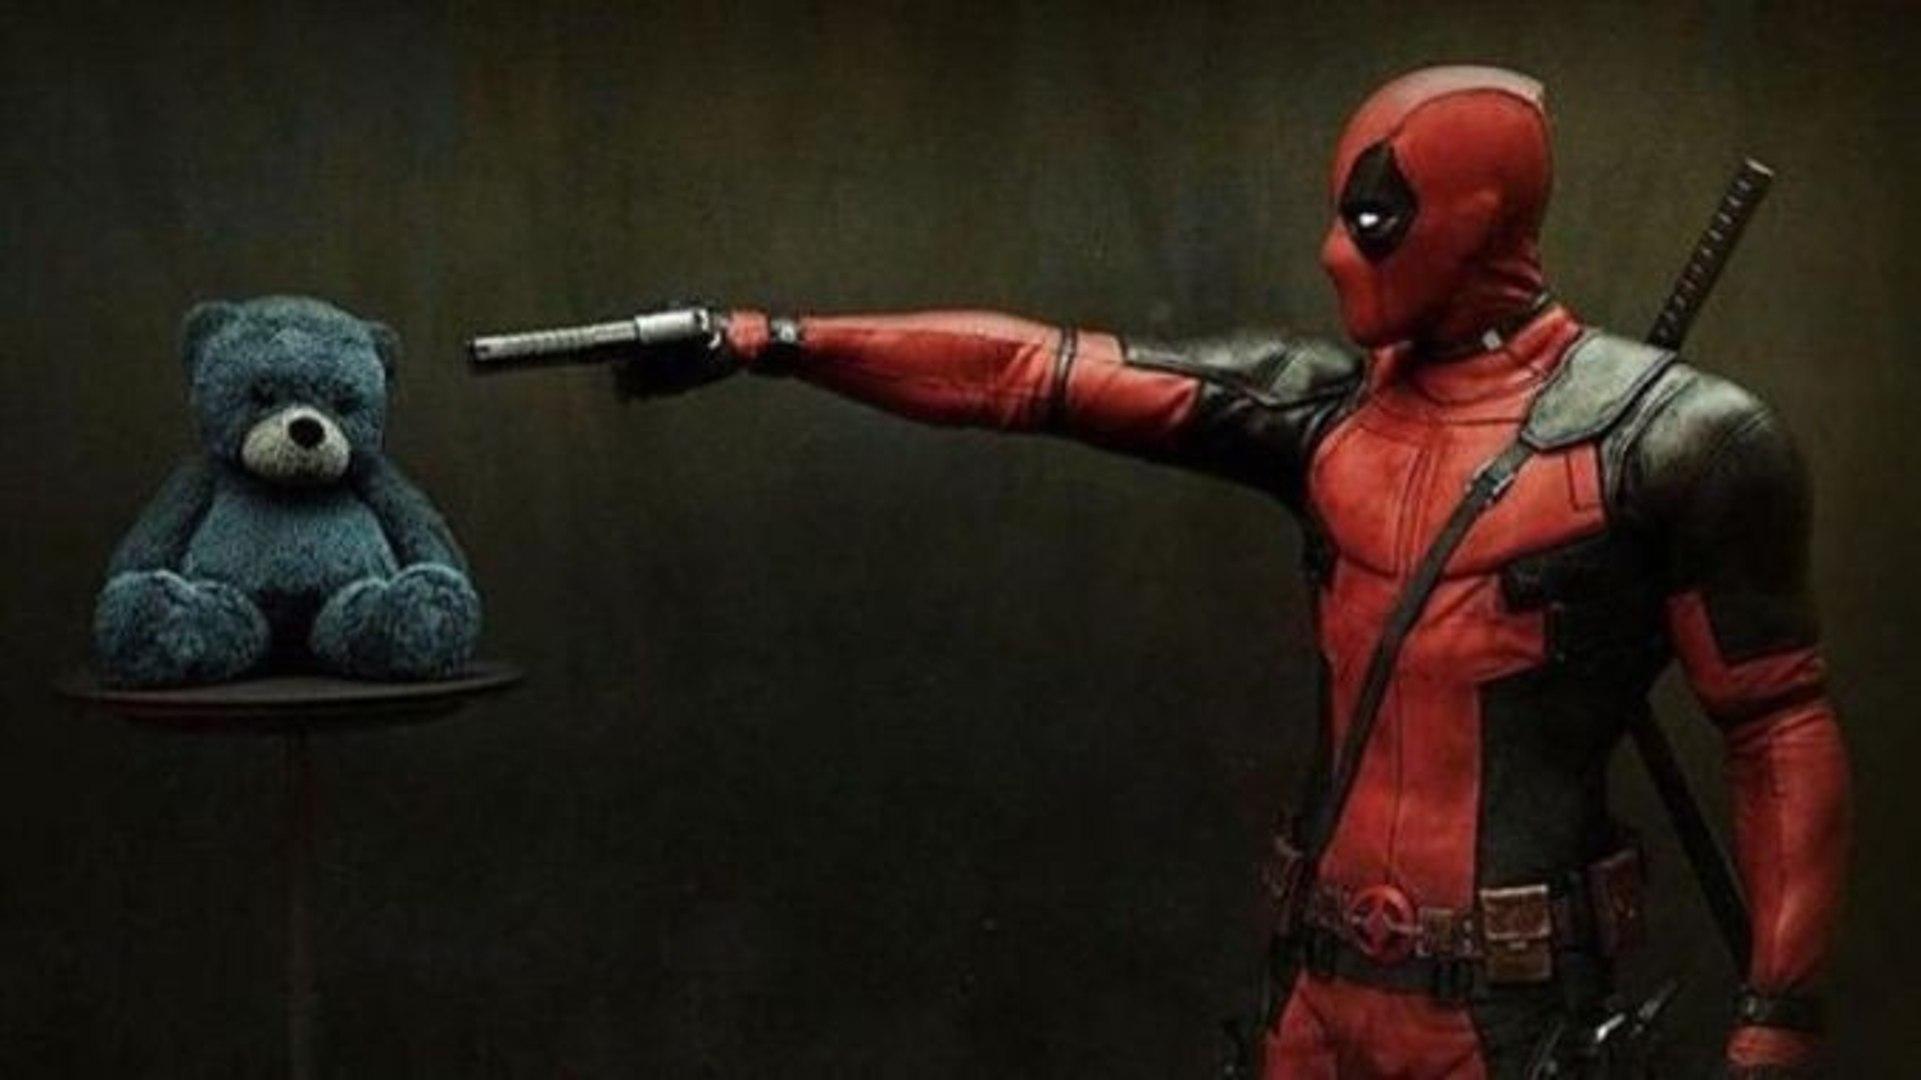 deadpool 2 free movie online download